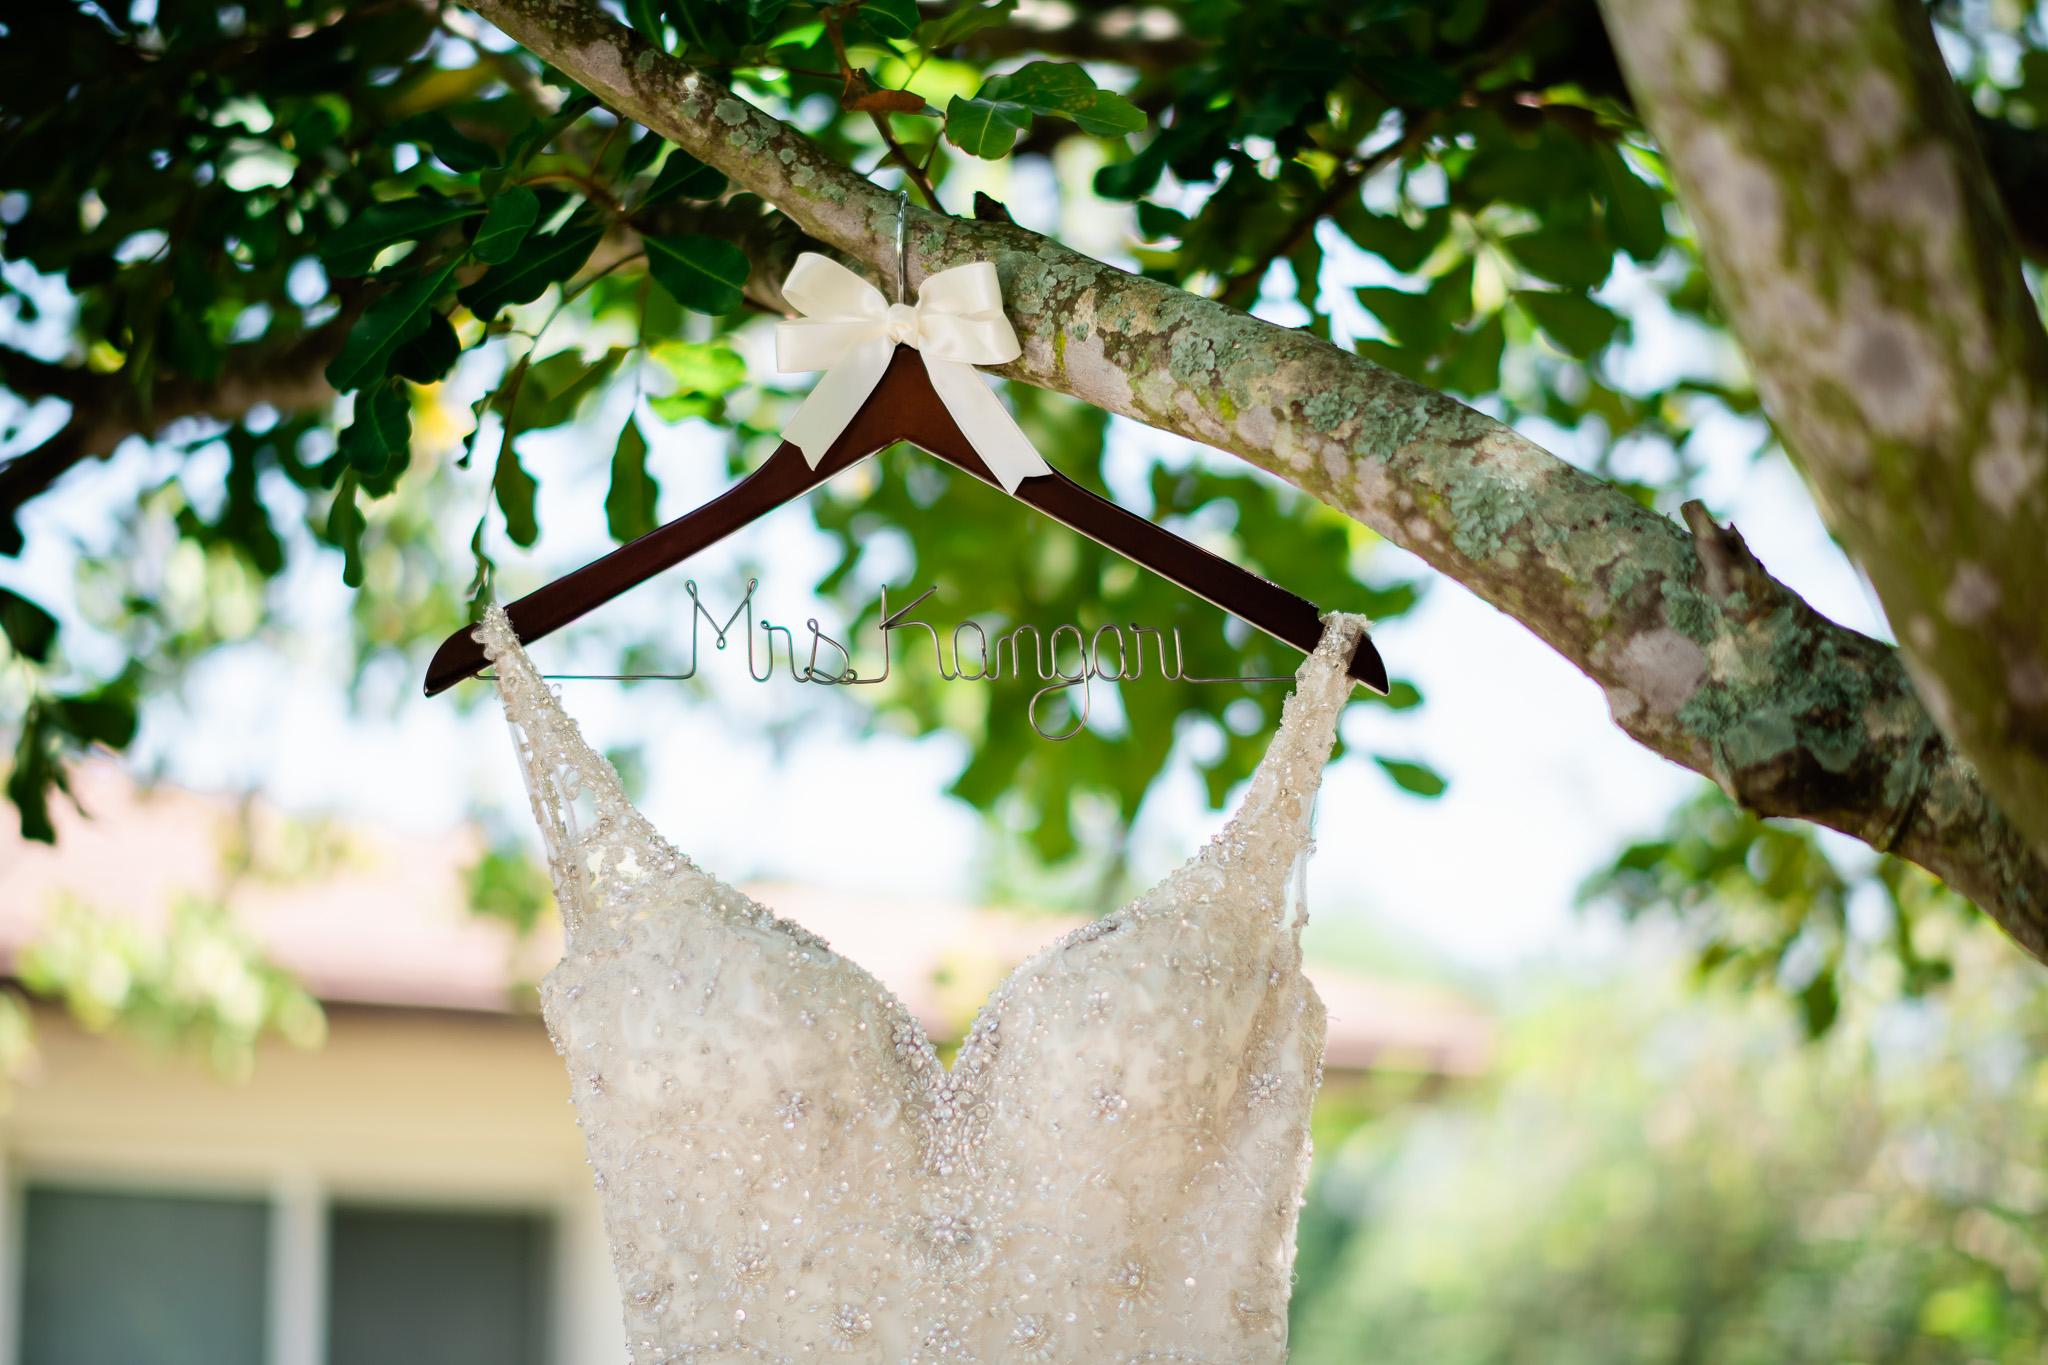 TAMPA_WEDDING_PHOTOGRAPHER_MPMZ_Z85_7687_0010.jpg